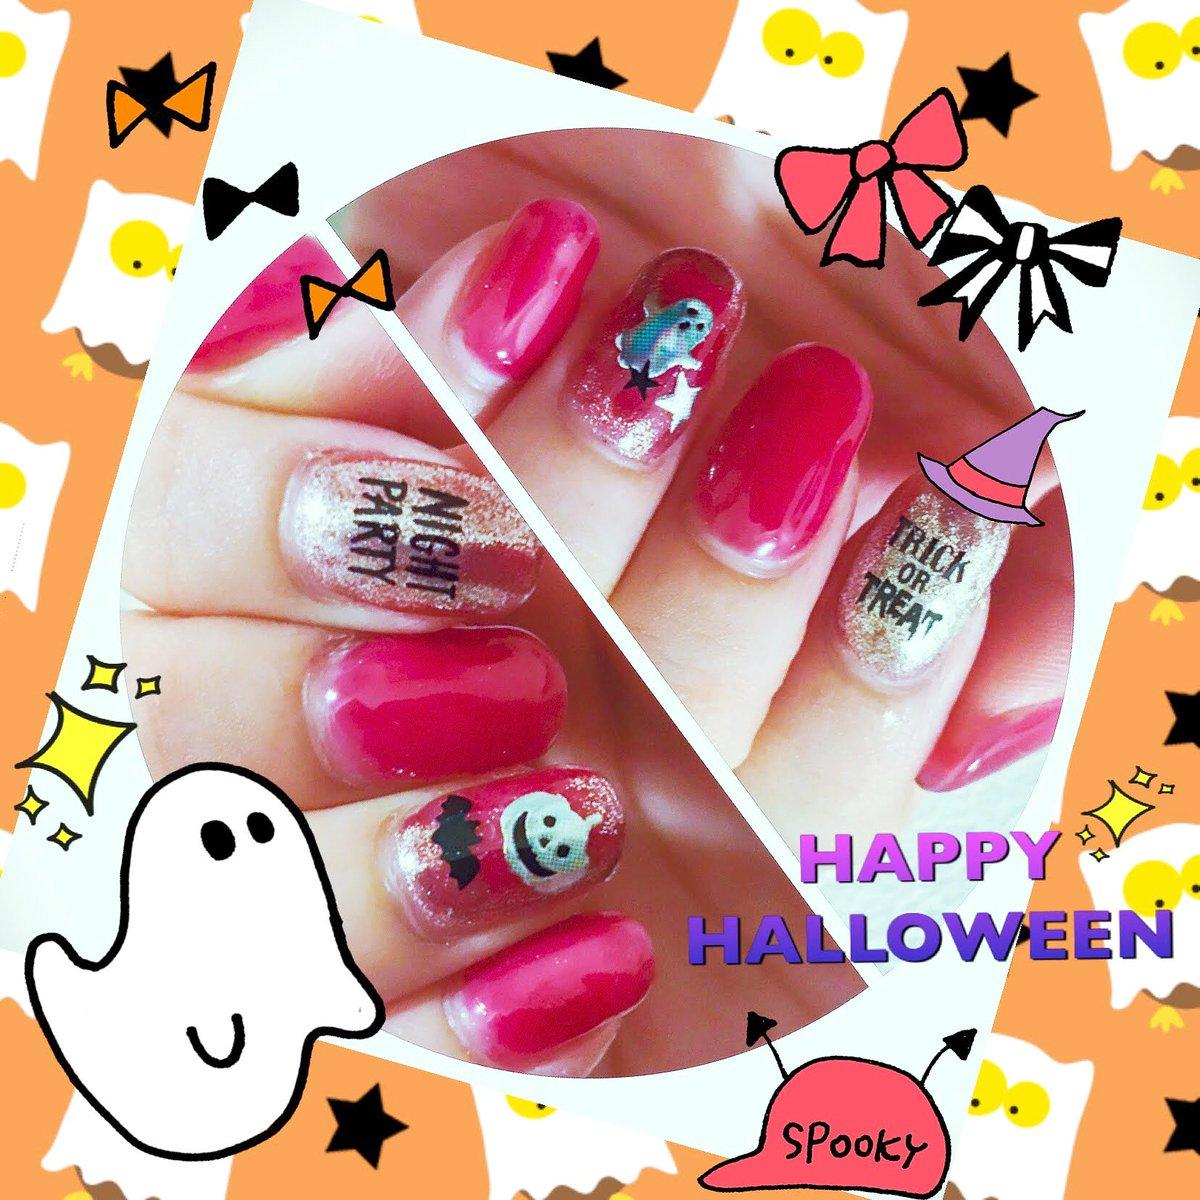 test ツイッターメディア - 今年のHalloweenネイル??? HappyHalloween?????? #halloween #ハロウィン #ハロウィンネイル #ハロウィンネイル?? #Halloweennail #happyhalloween #トリックオアトリート #homei #rakugel #seria #cando https://t.co/ThuaOEQXyV